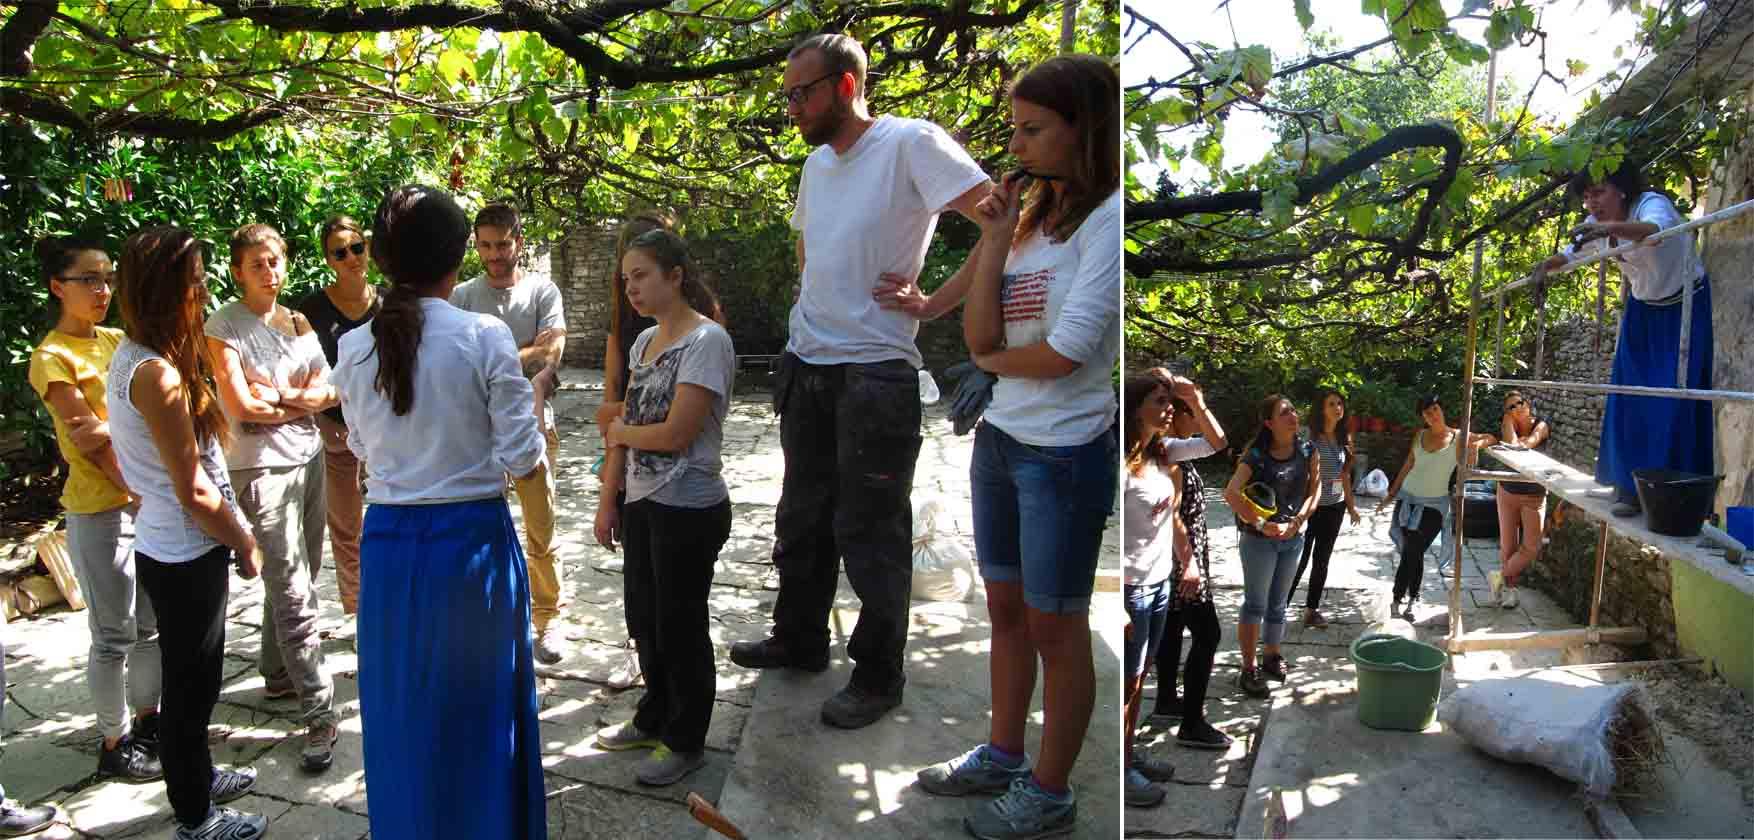 119 albanija gjirokastra radionica